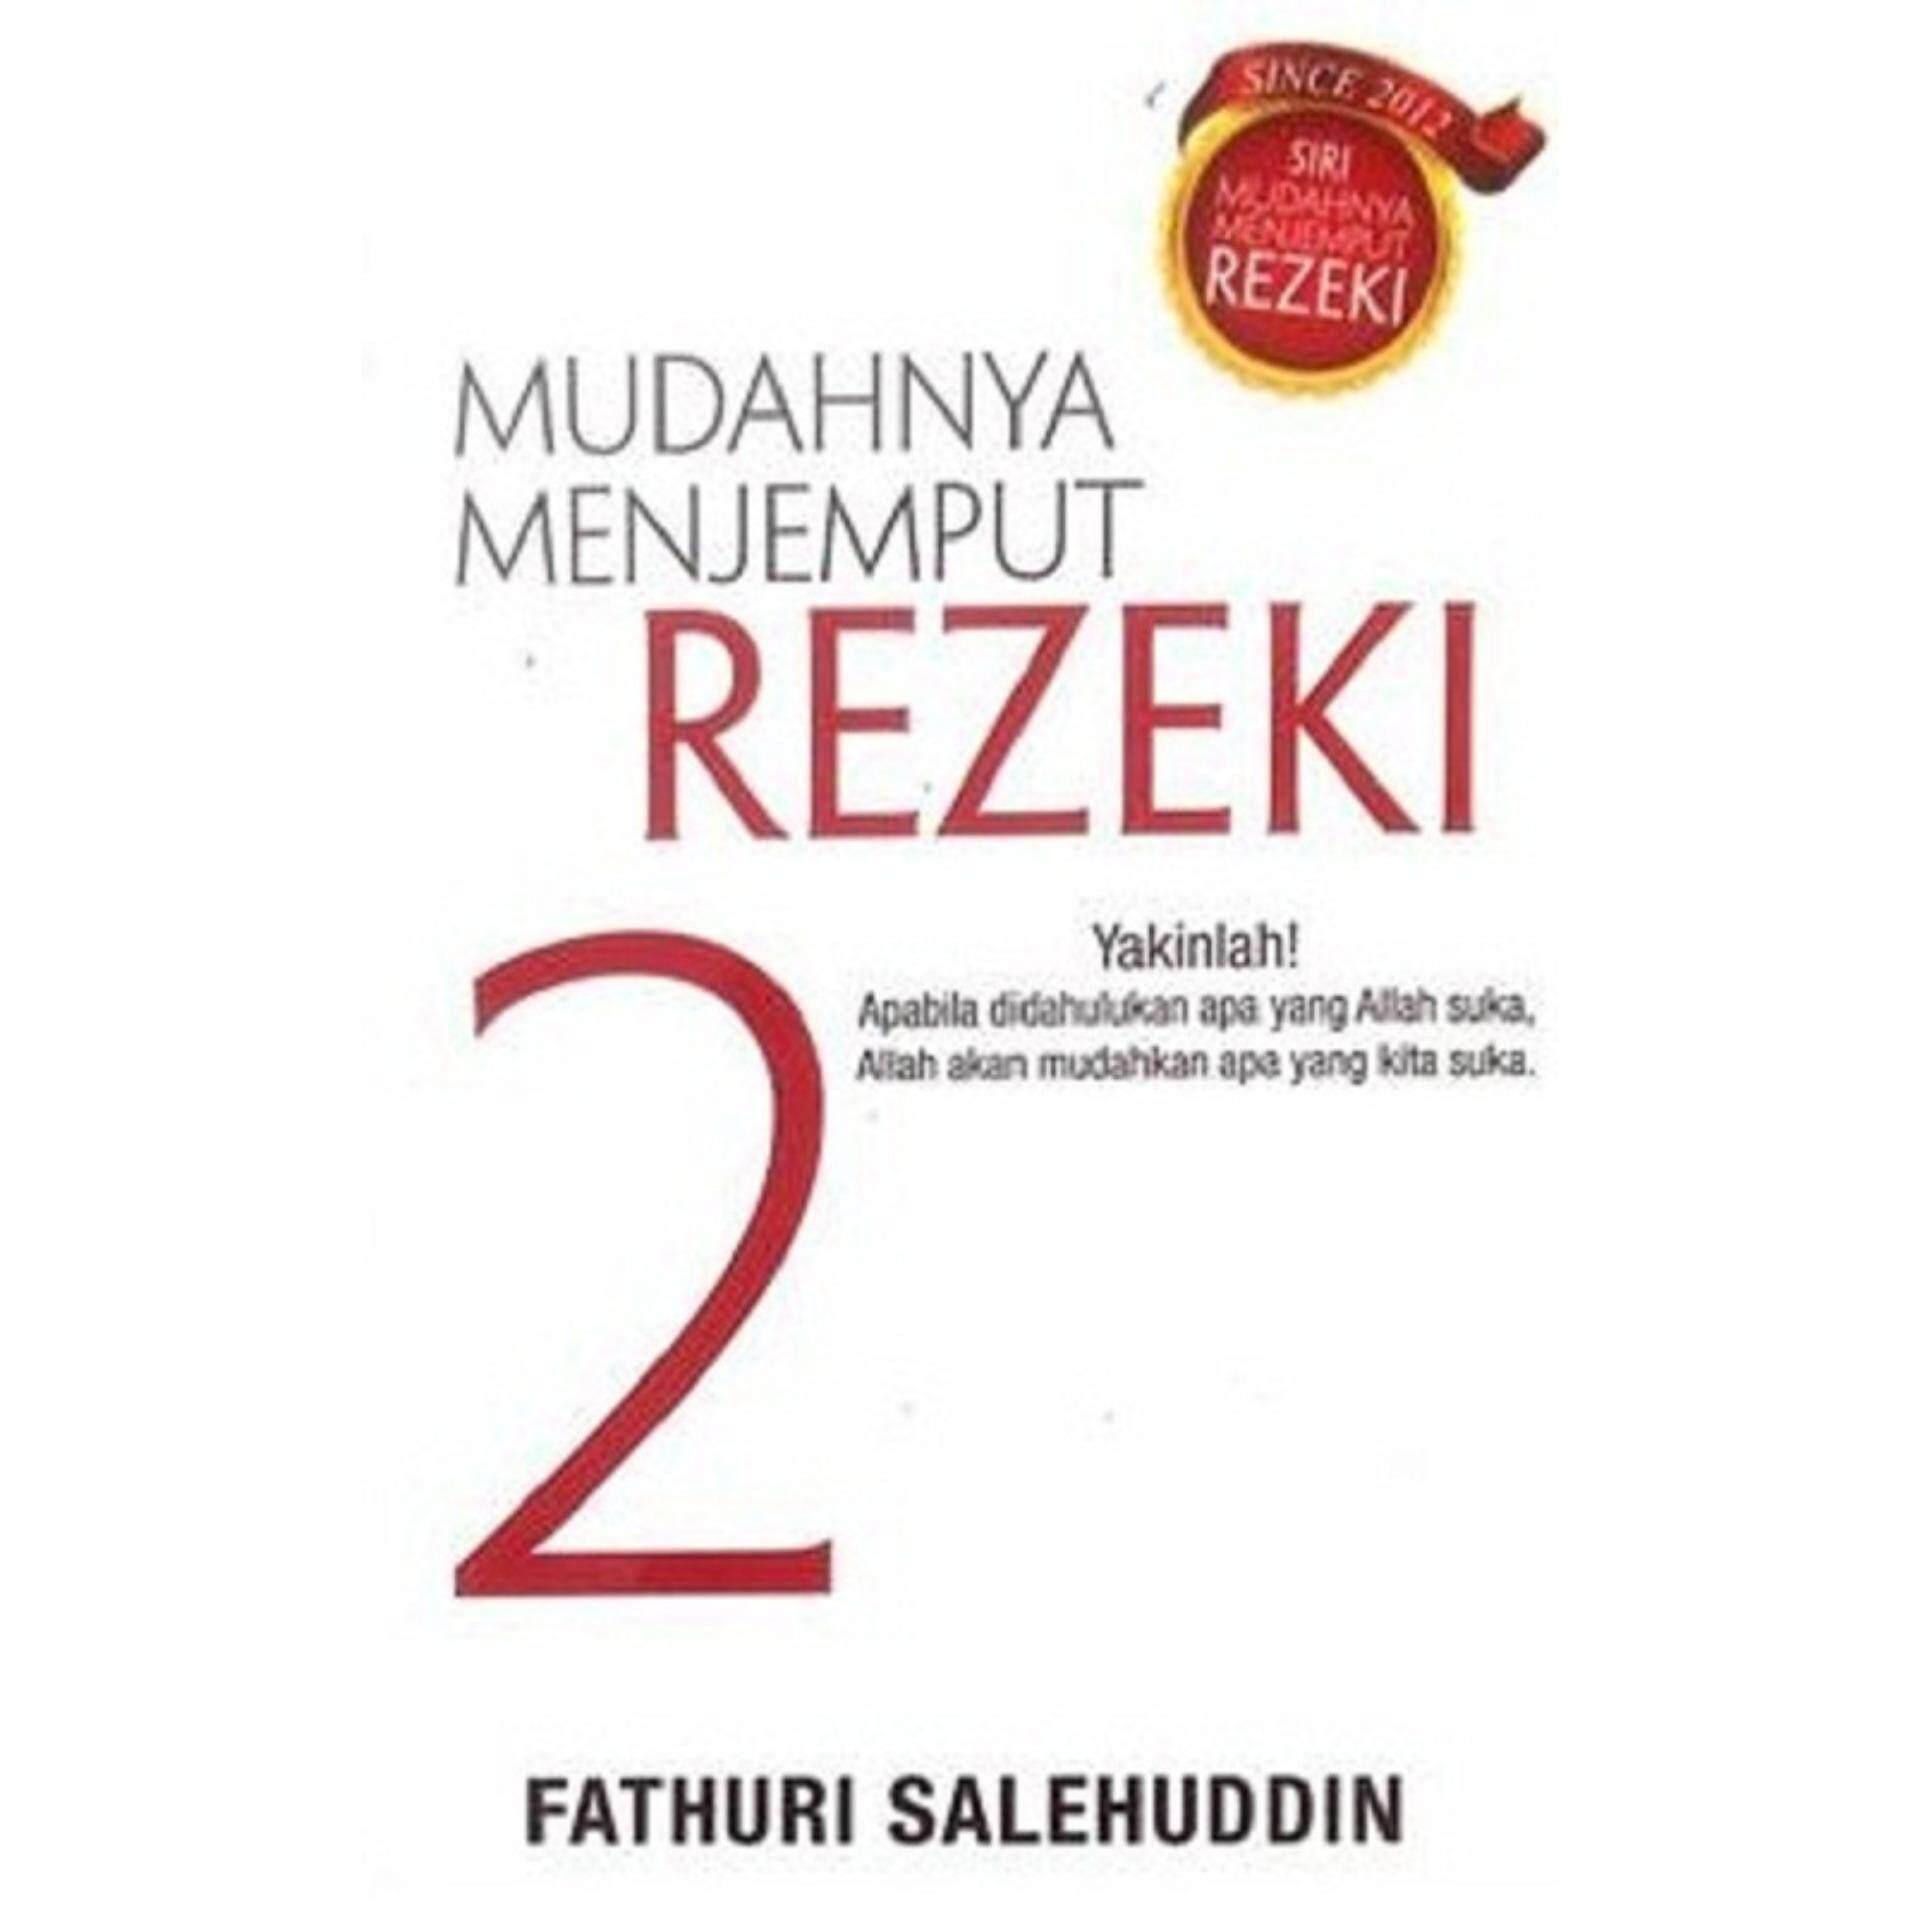 Mudahnya Menjemput Rezeki #2  Isbn: 9789671173411  Author:  Fathuri Salehuddin